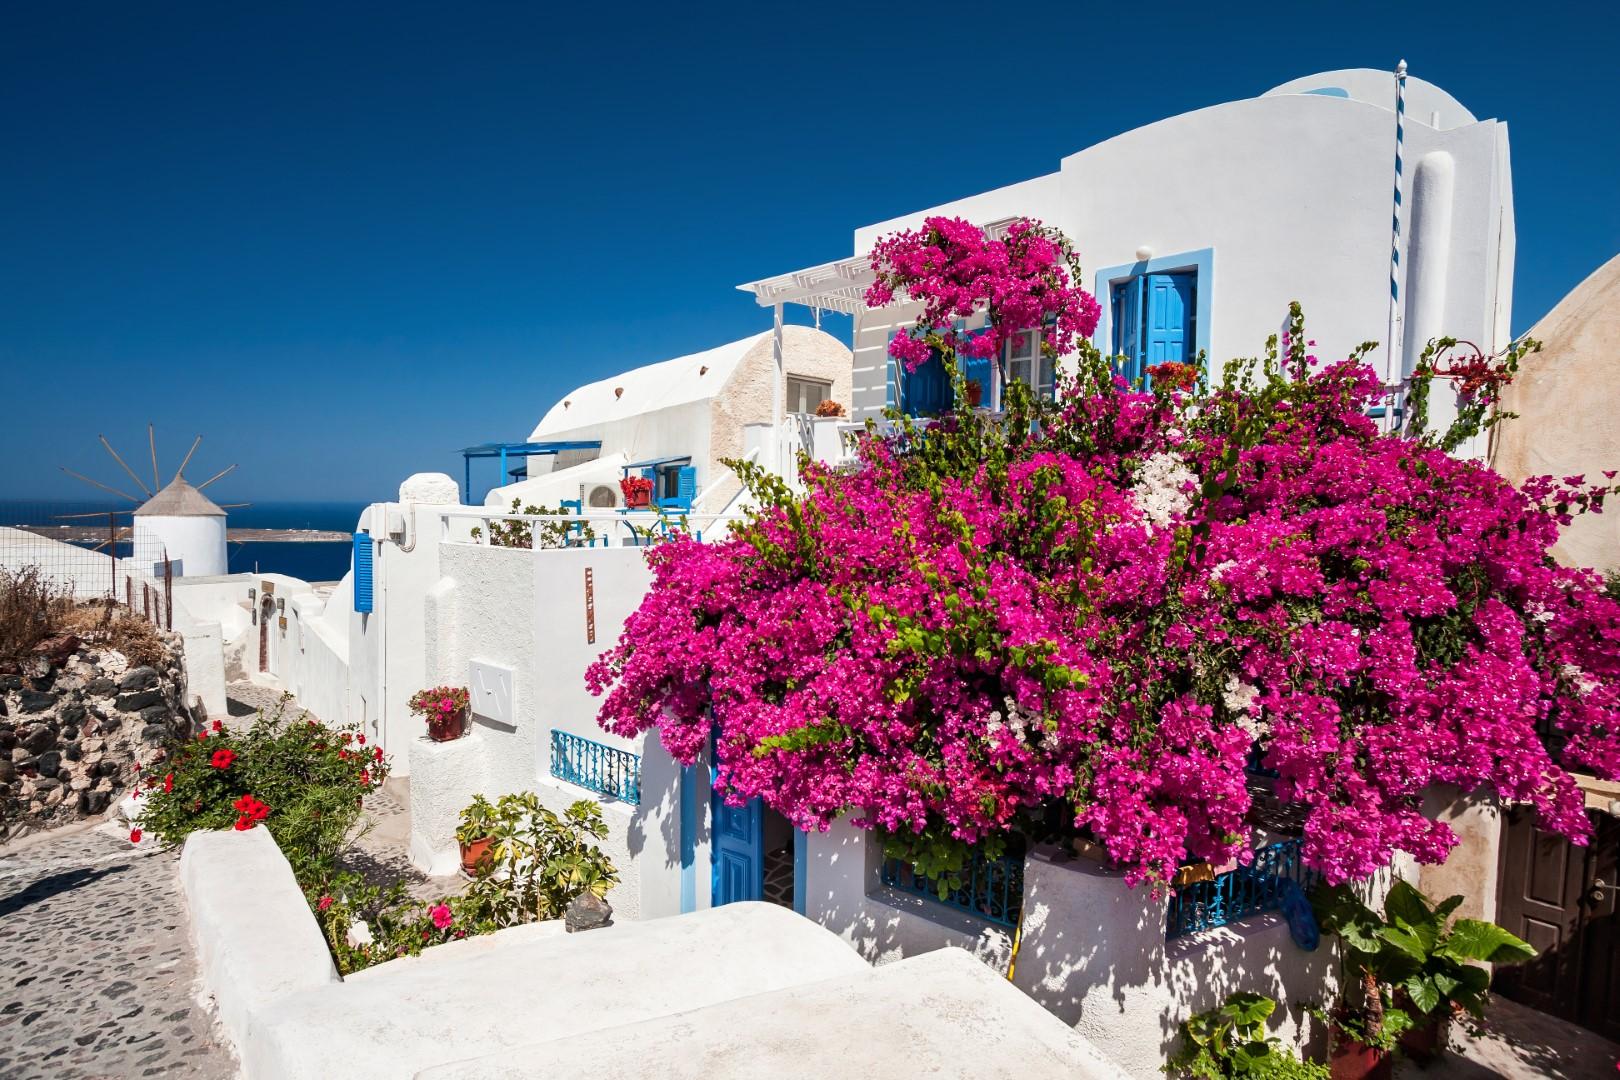 The Greek property market is gaining momentum